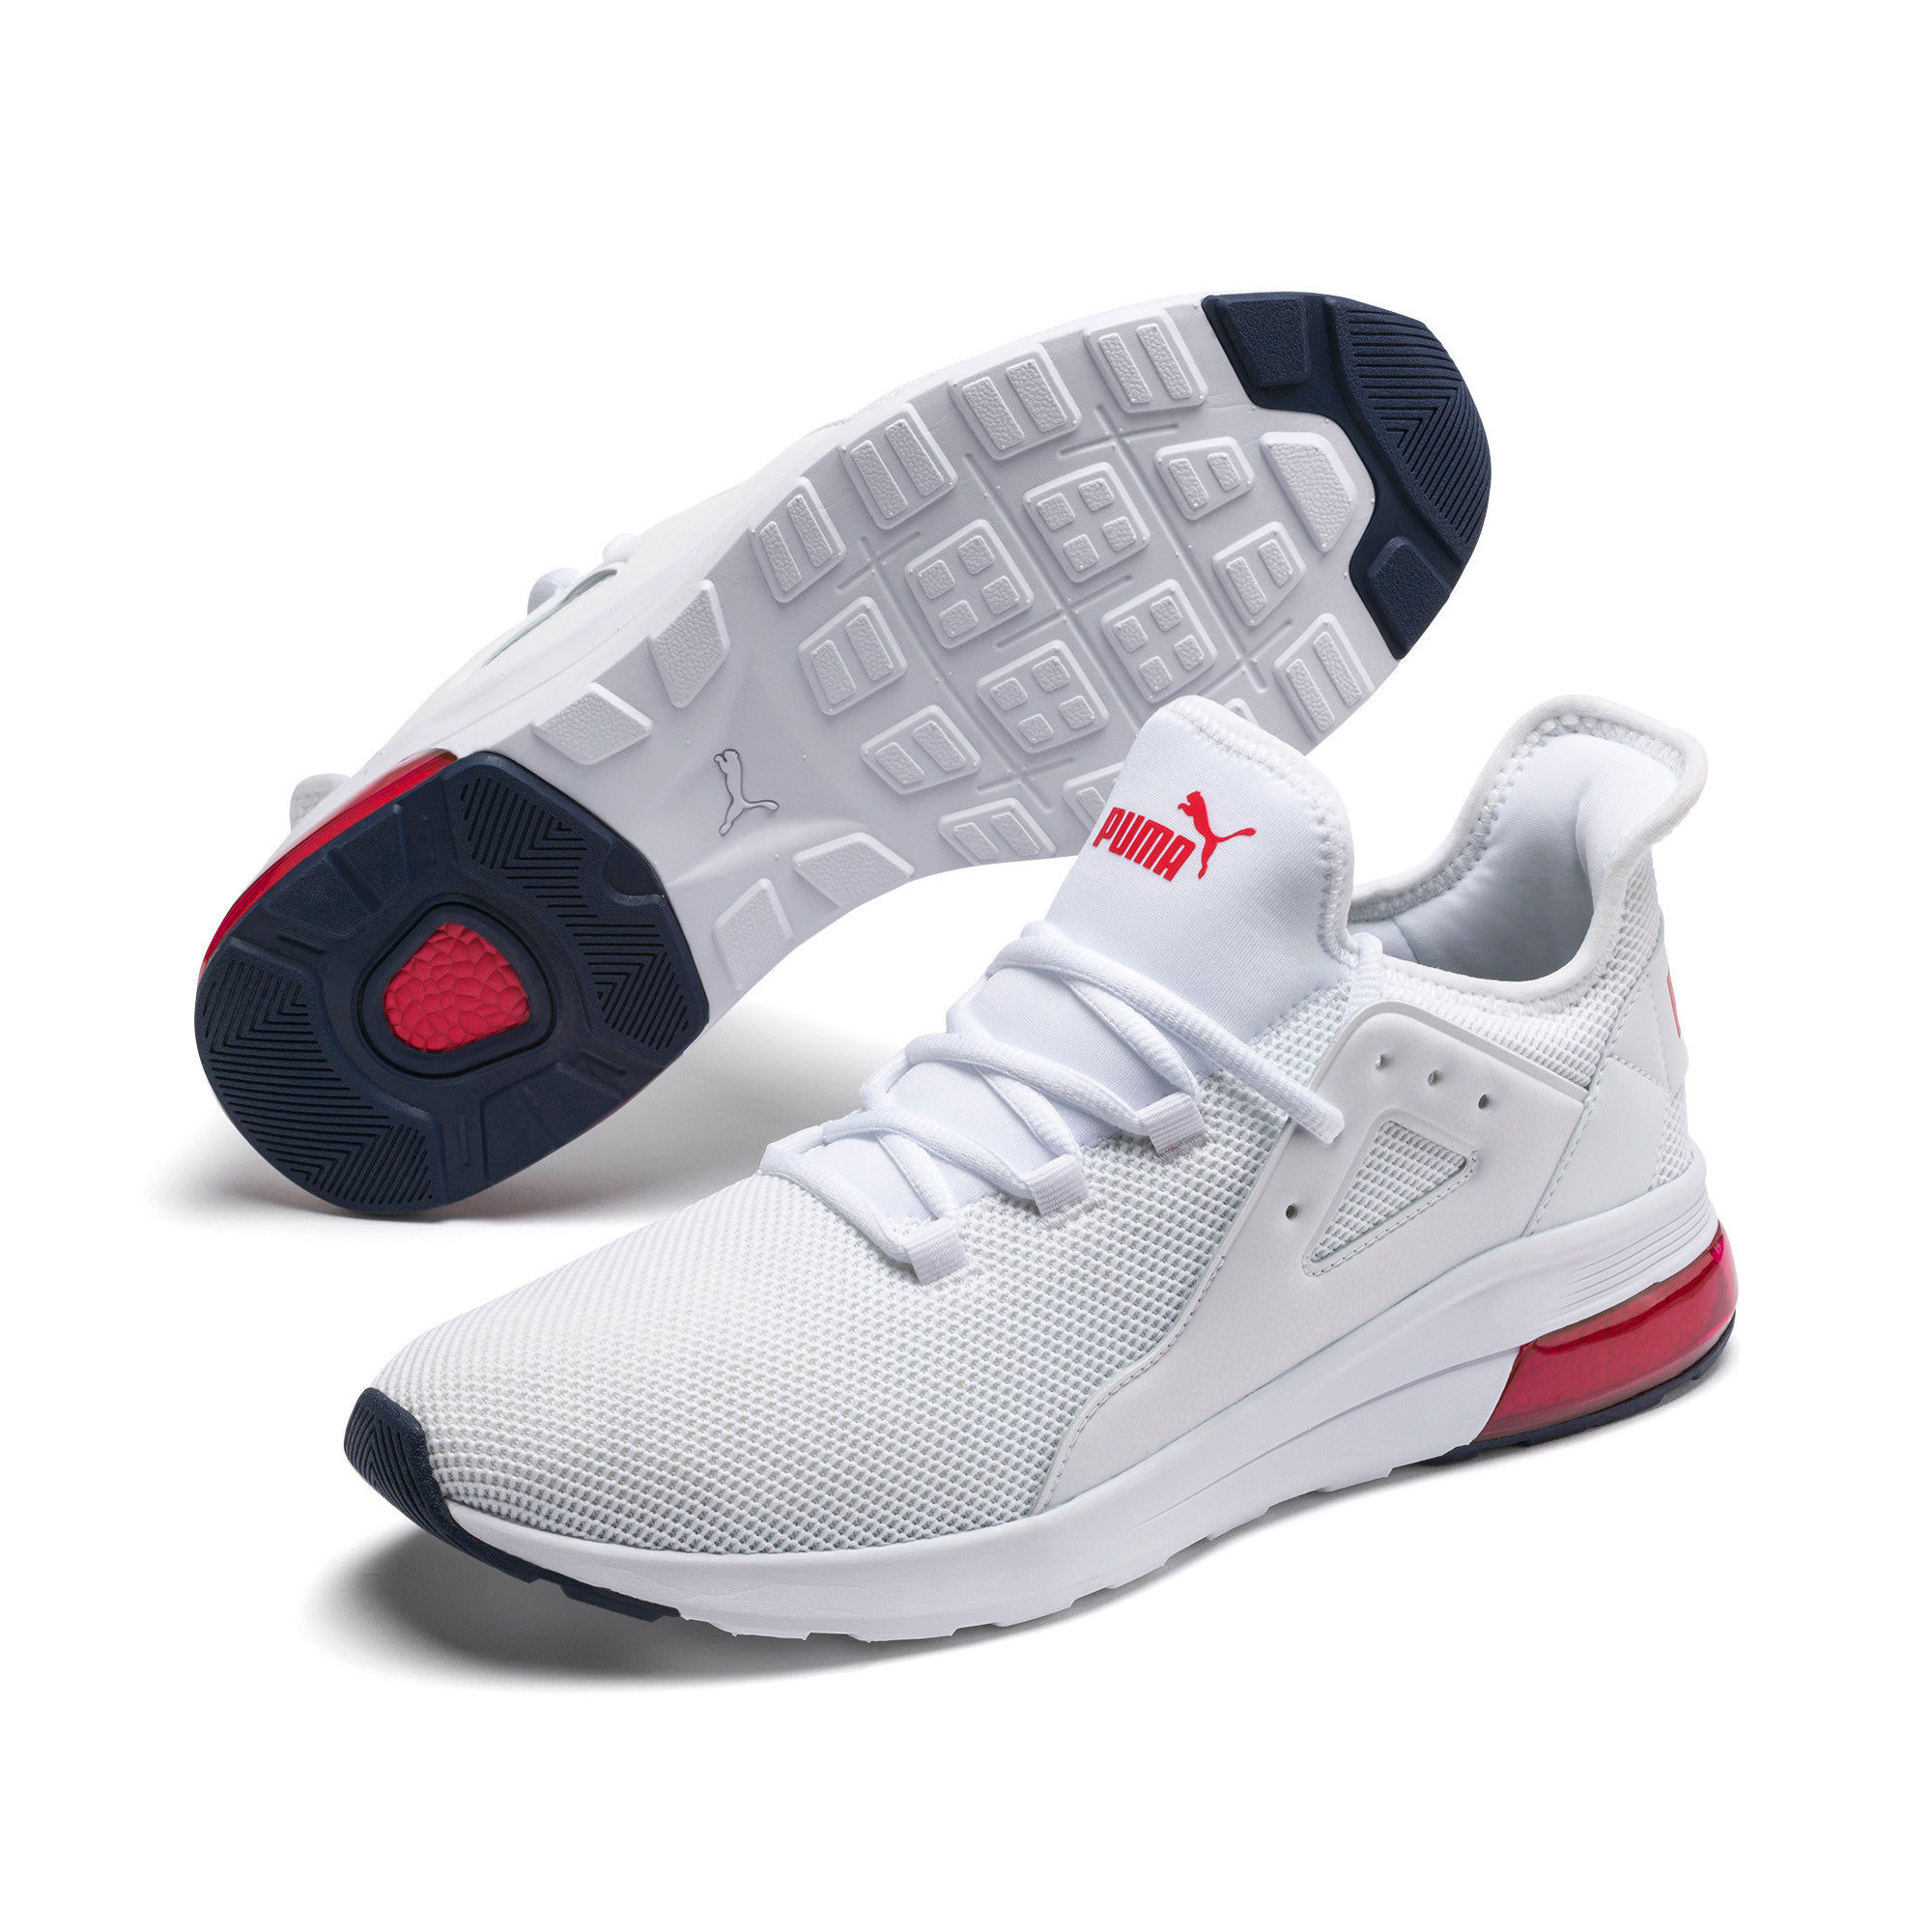 Puma Electron Street Shoes: Buy Puma